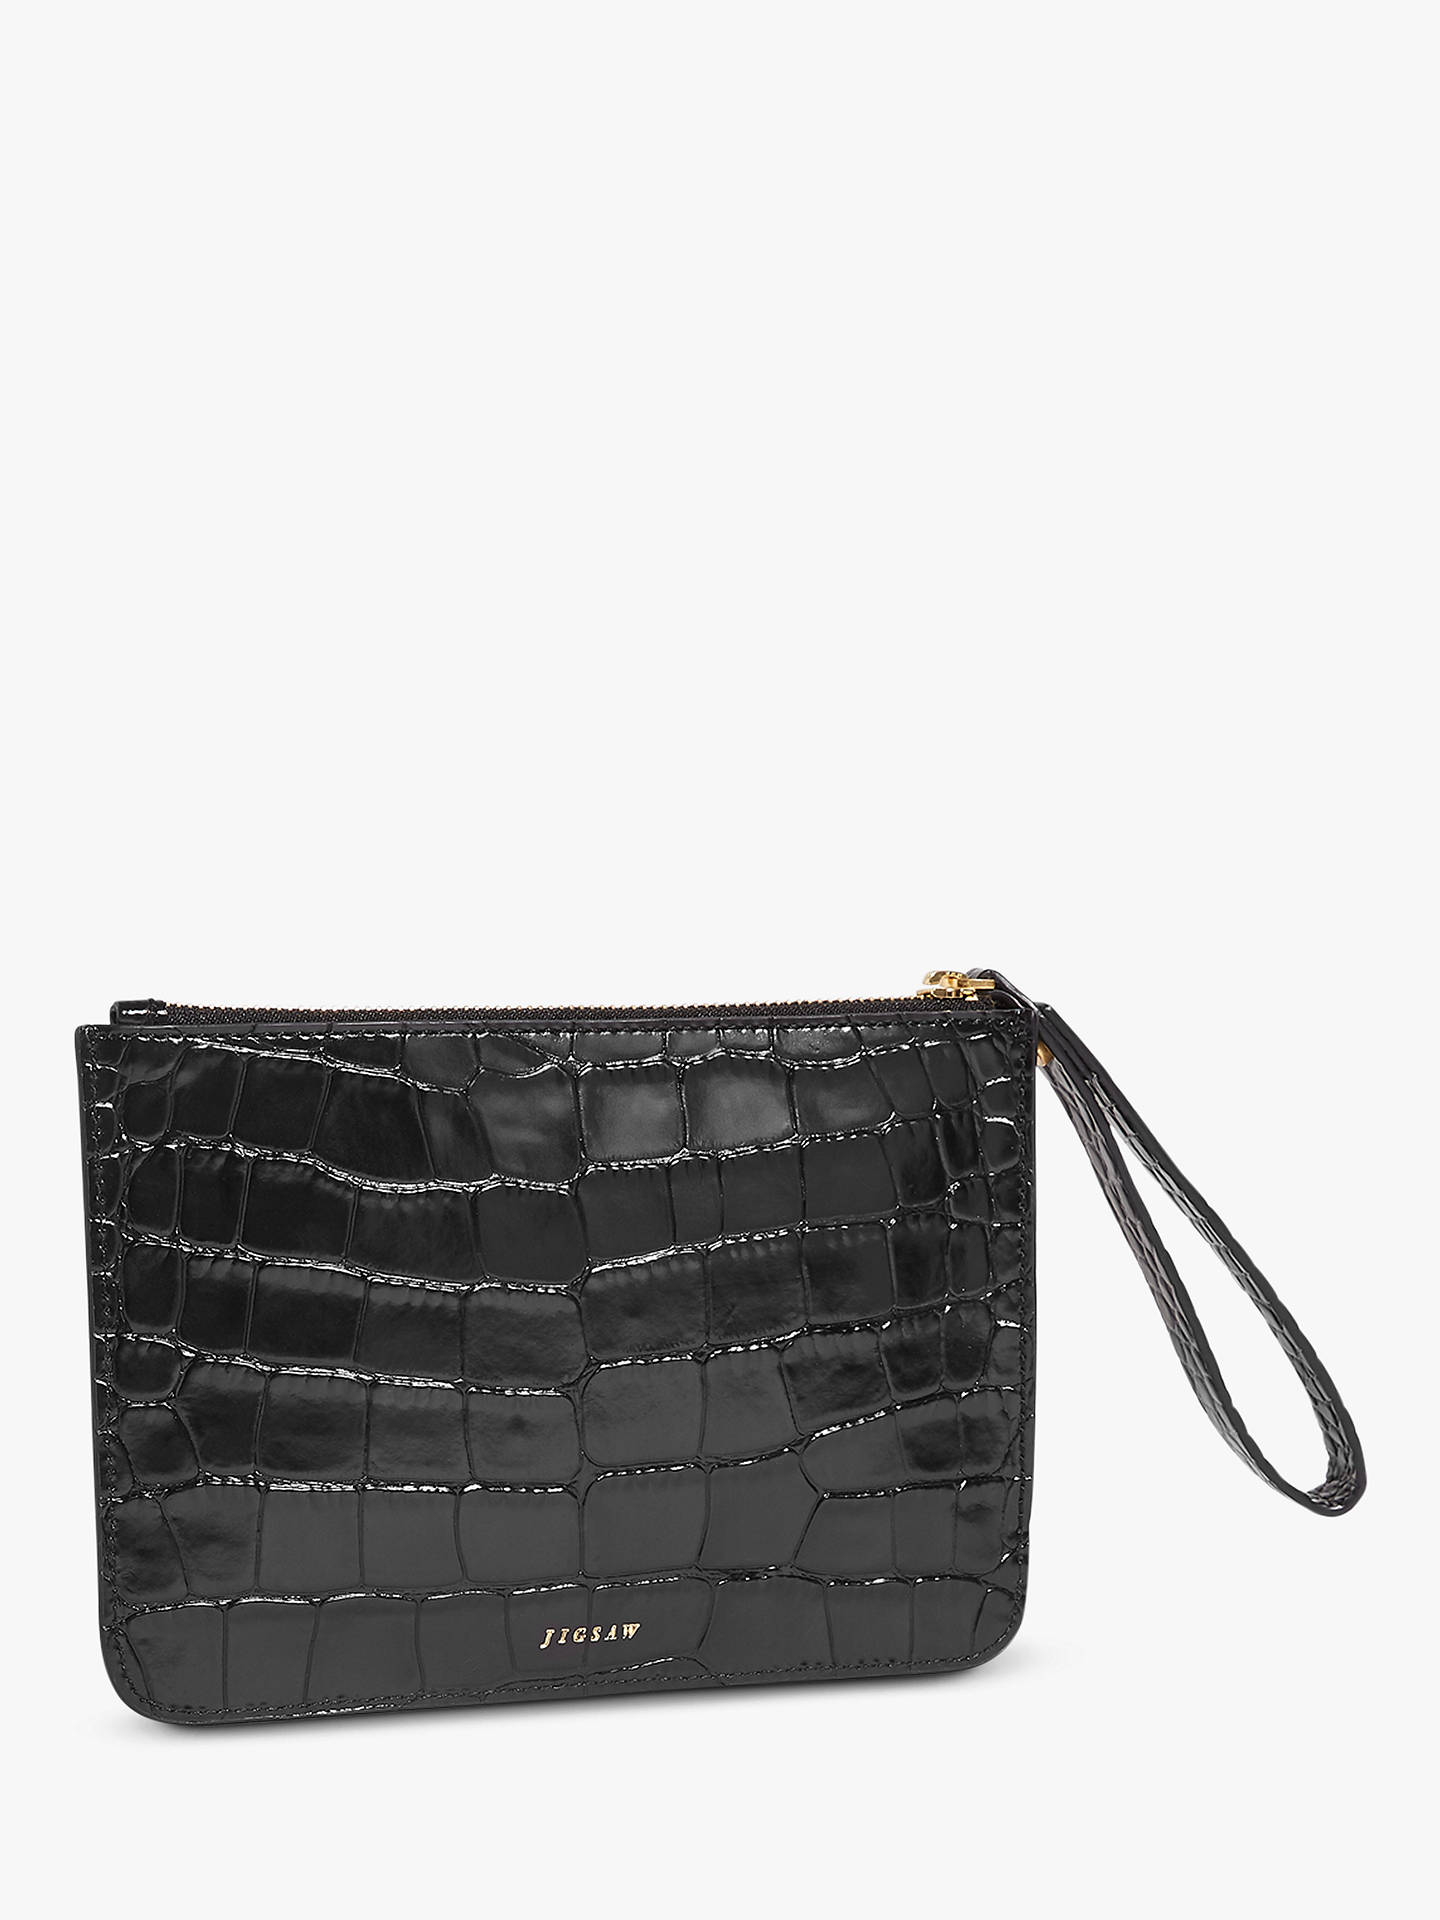 6d9446182 Buy Jigsaw Croc Leather Clutch Bag, Black Online at johnlewis.com ...